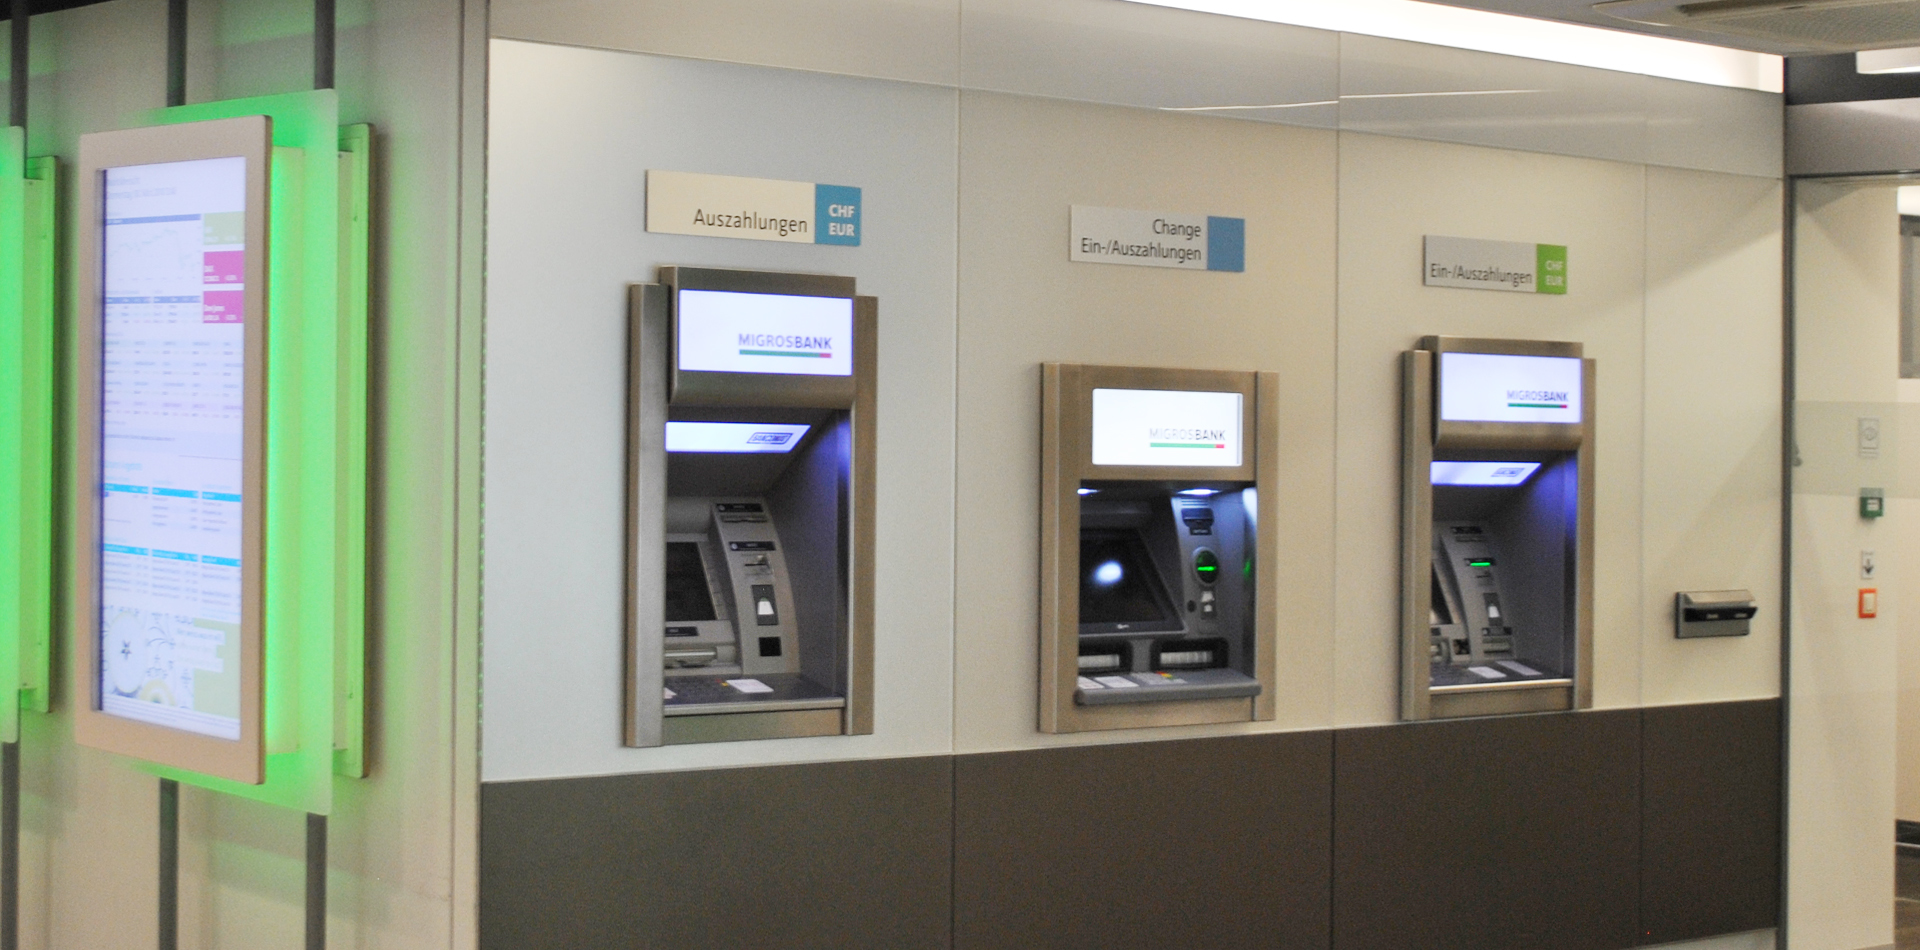 migrosbankbankomat